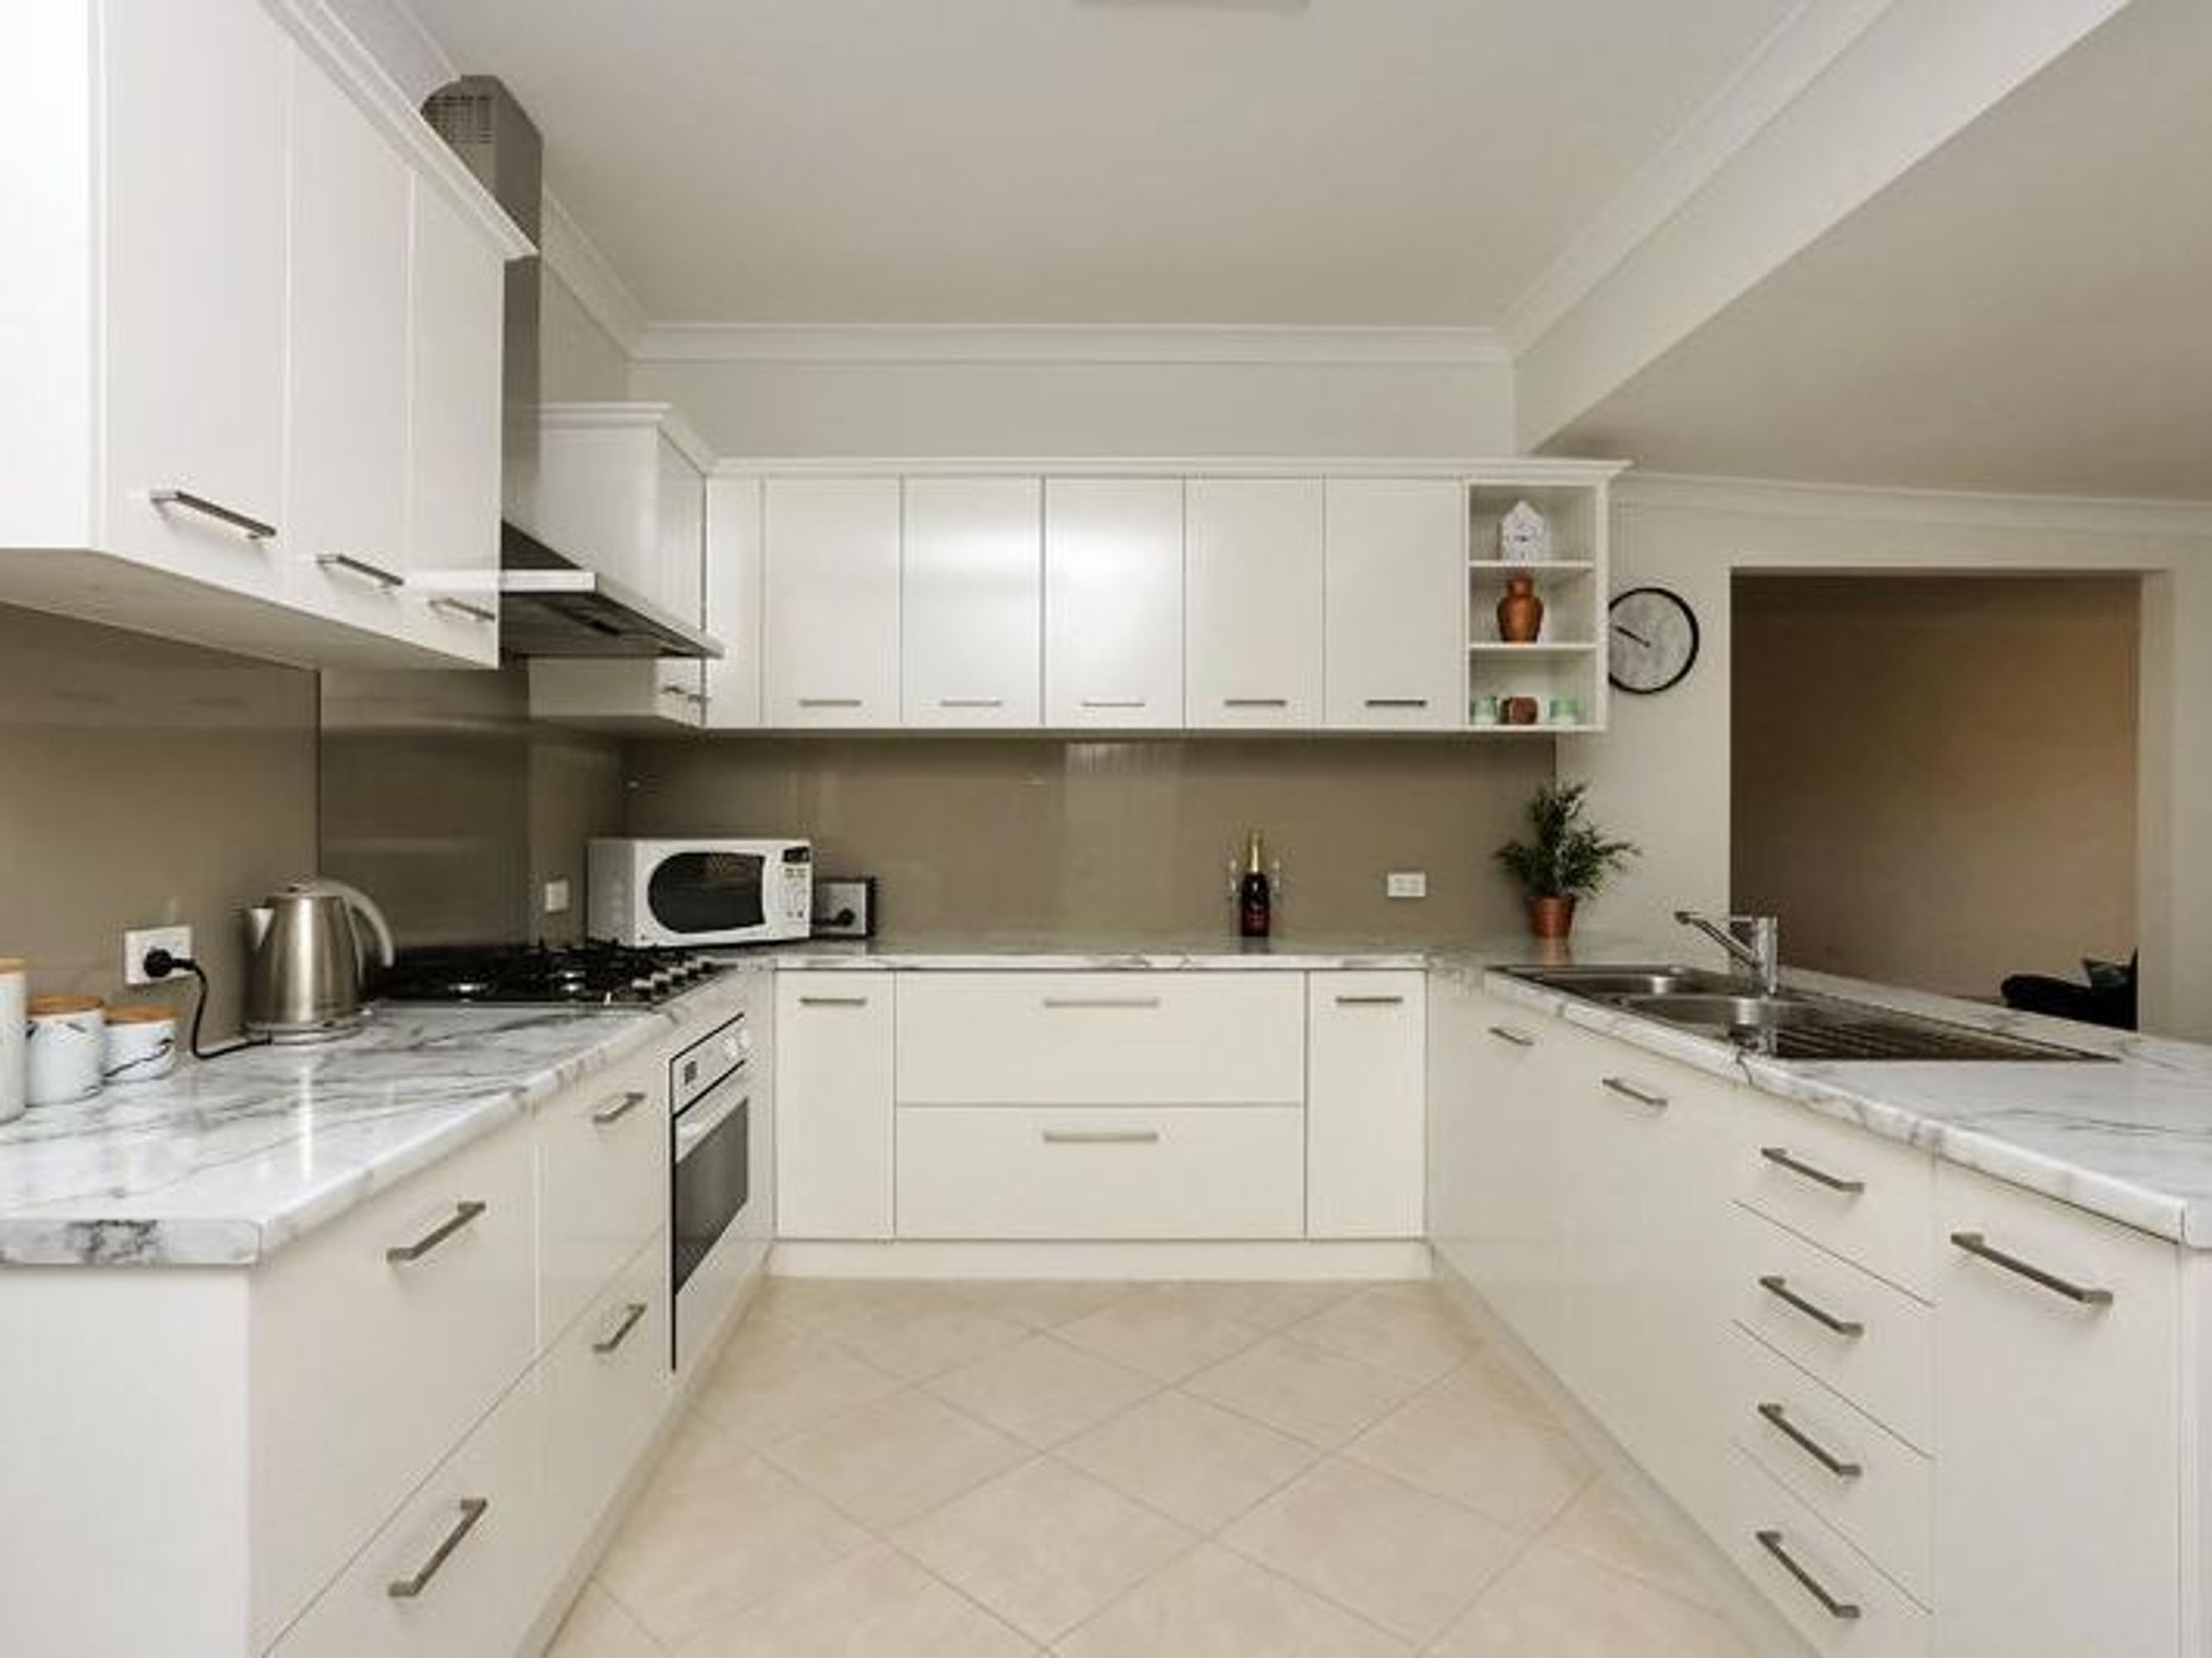 572 Silica, Broken Hill, NSW 2880